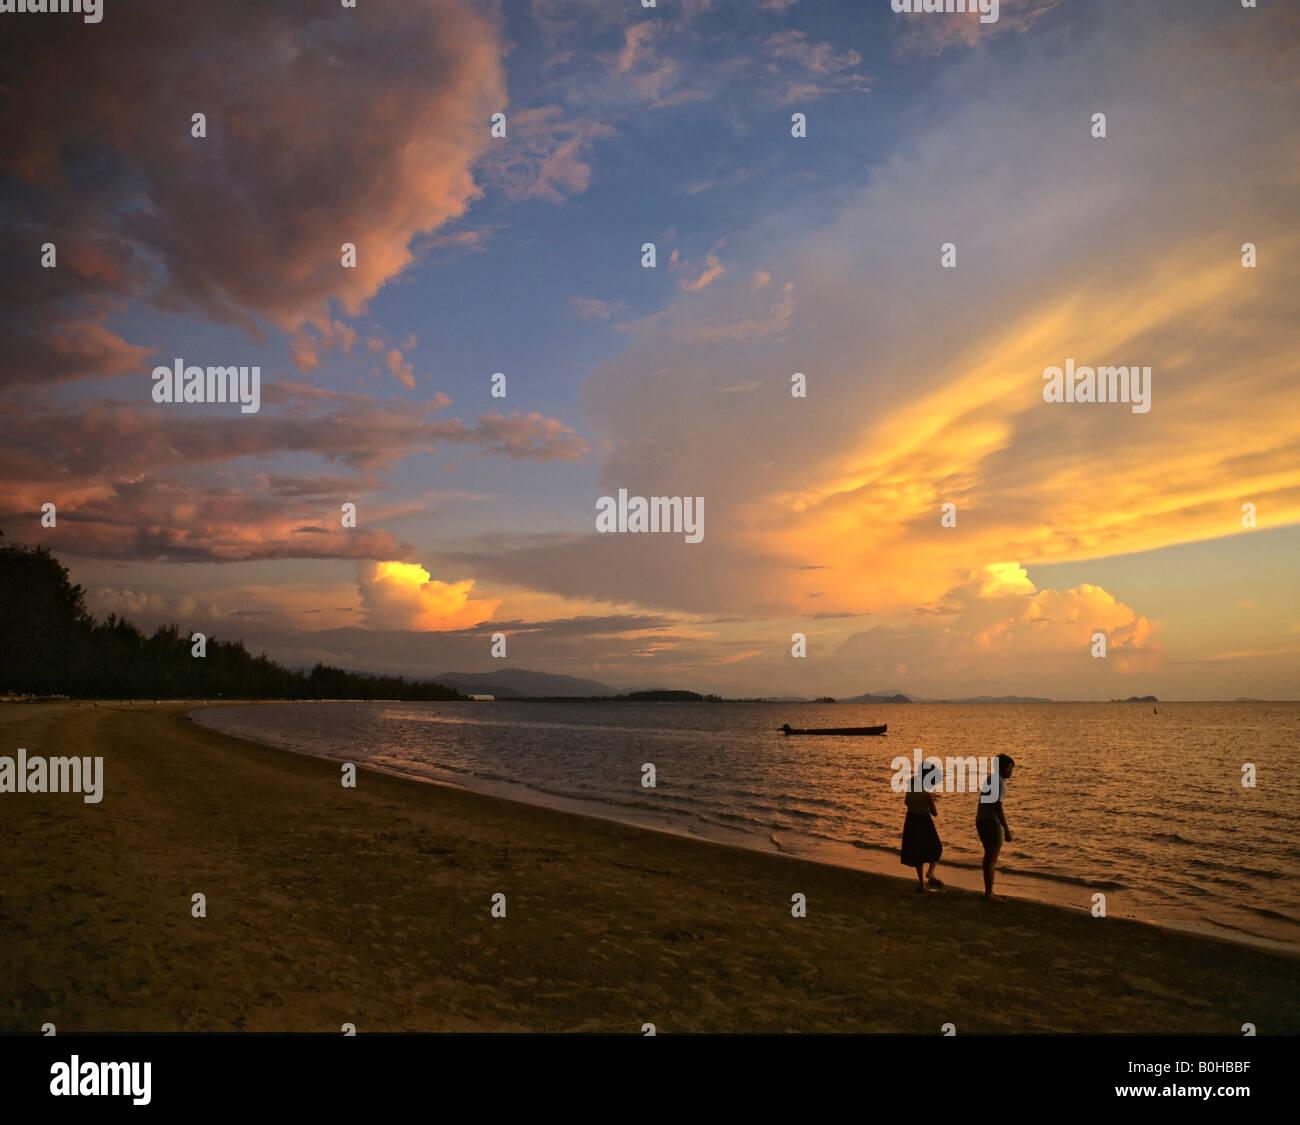 Evening light, two children on a beach, Kota Kinabalu, Borneo, Malaysia - Stock Image